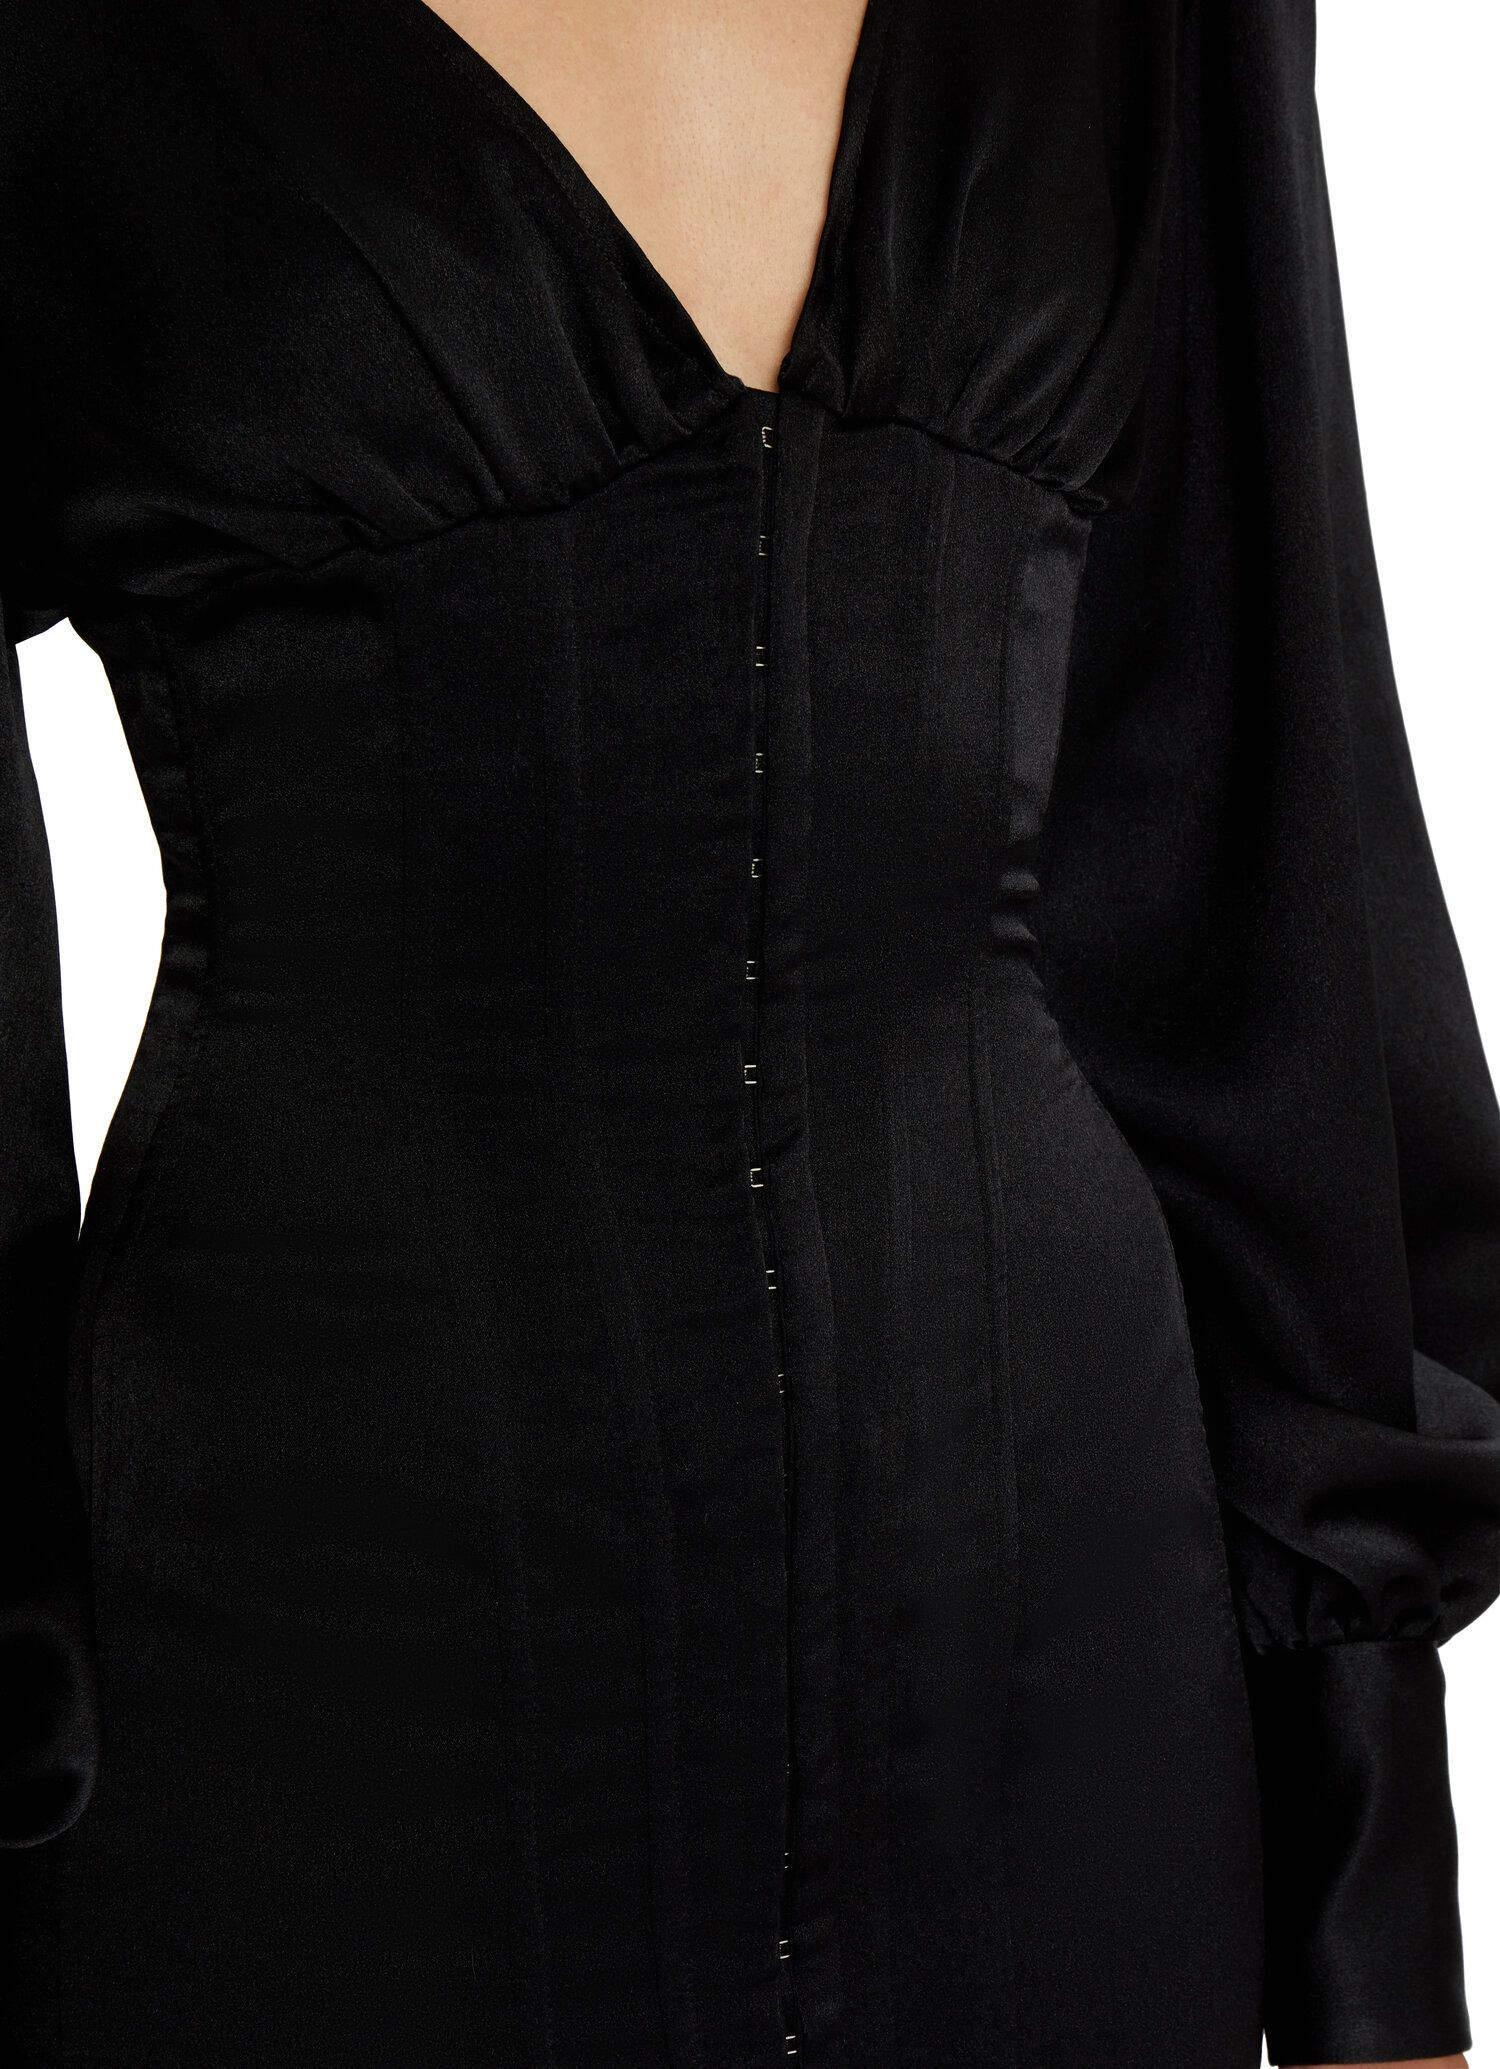 Long Sleeve Satin Corset Dress Danielle Guizio Satin Corset Dress Satin Corset Corset Dress [ 2069 x 1500 Pixel ]